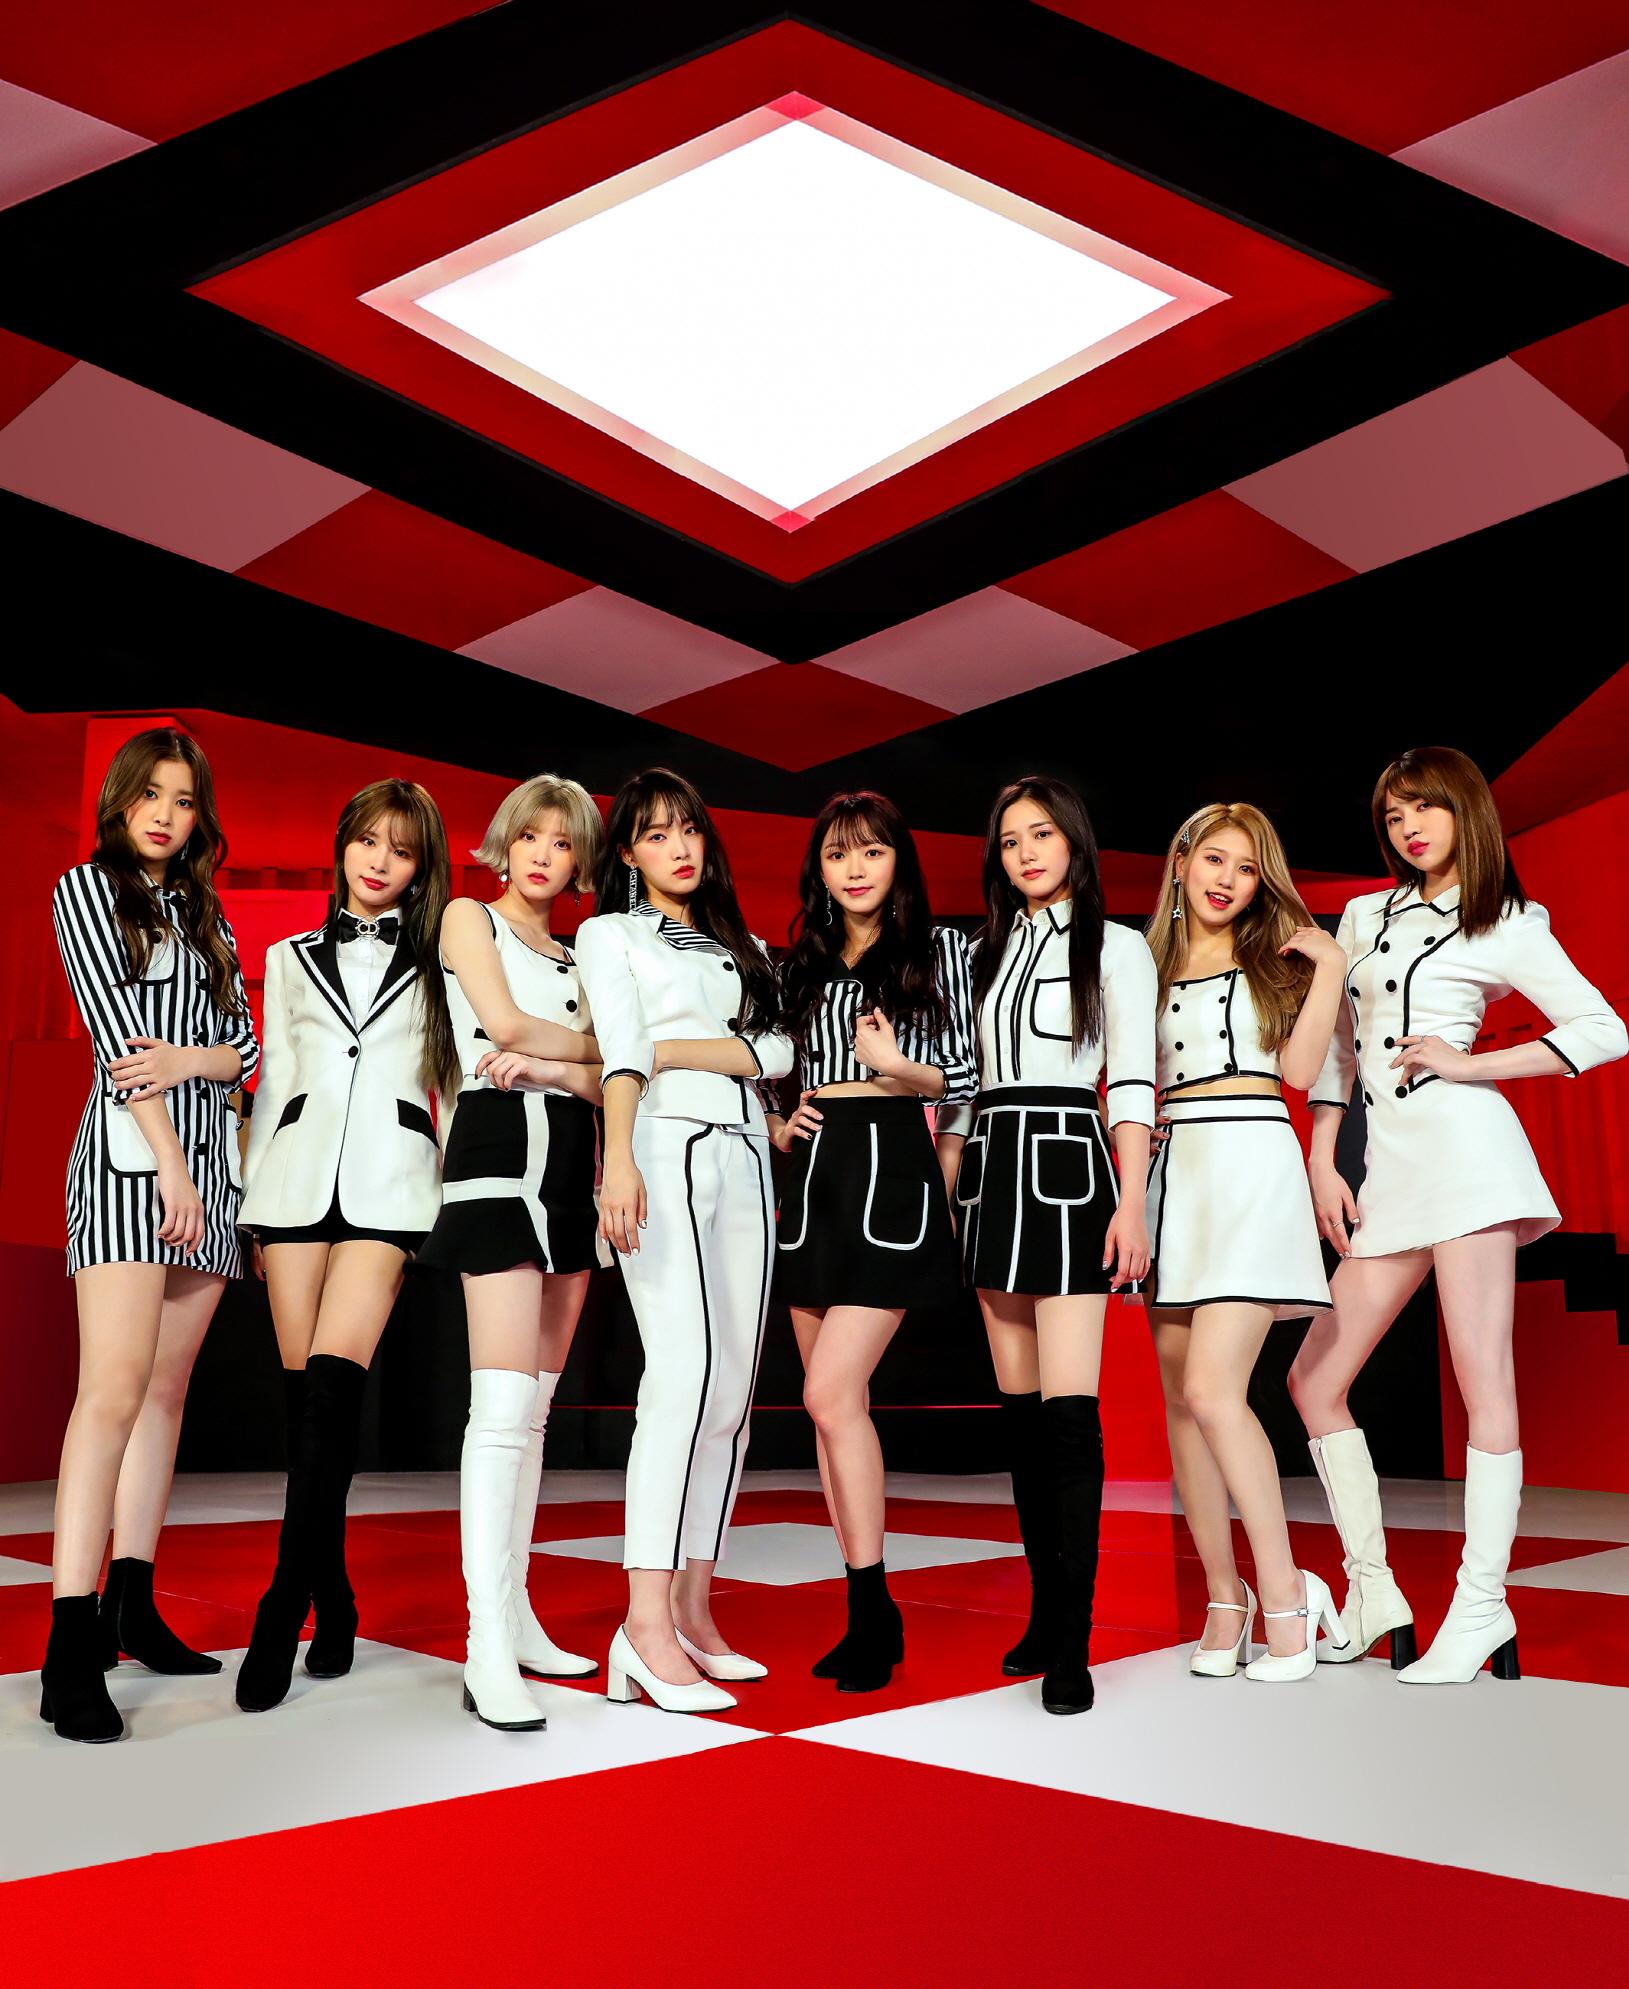 NATURE   Kpop Wiki   Fandom in 2021   Kpop girls, Teenager outfits, Girls world